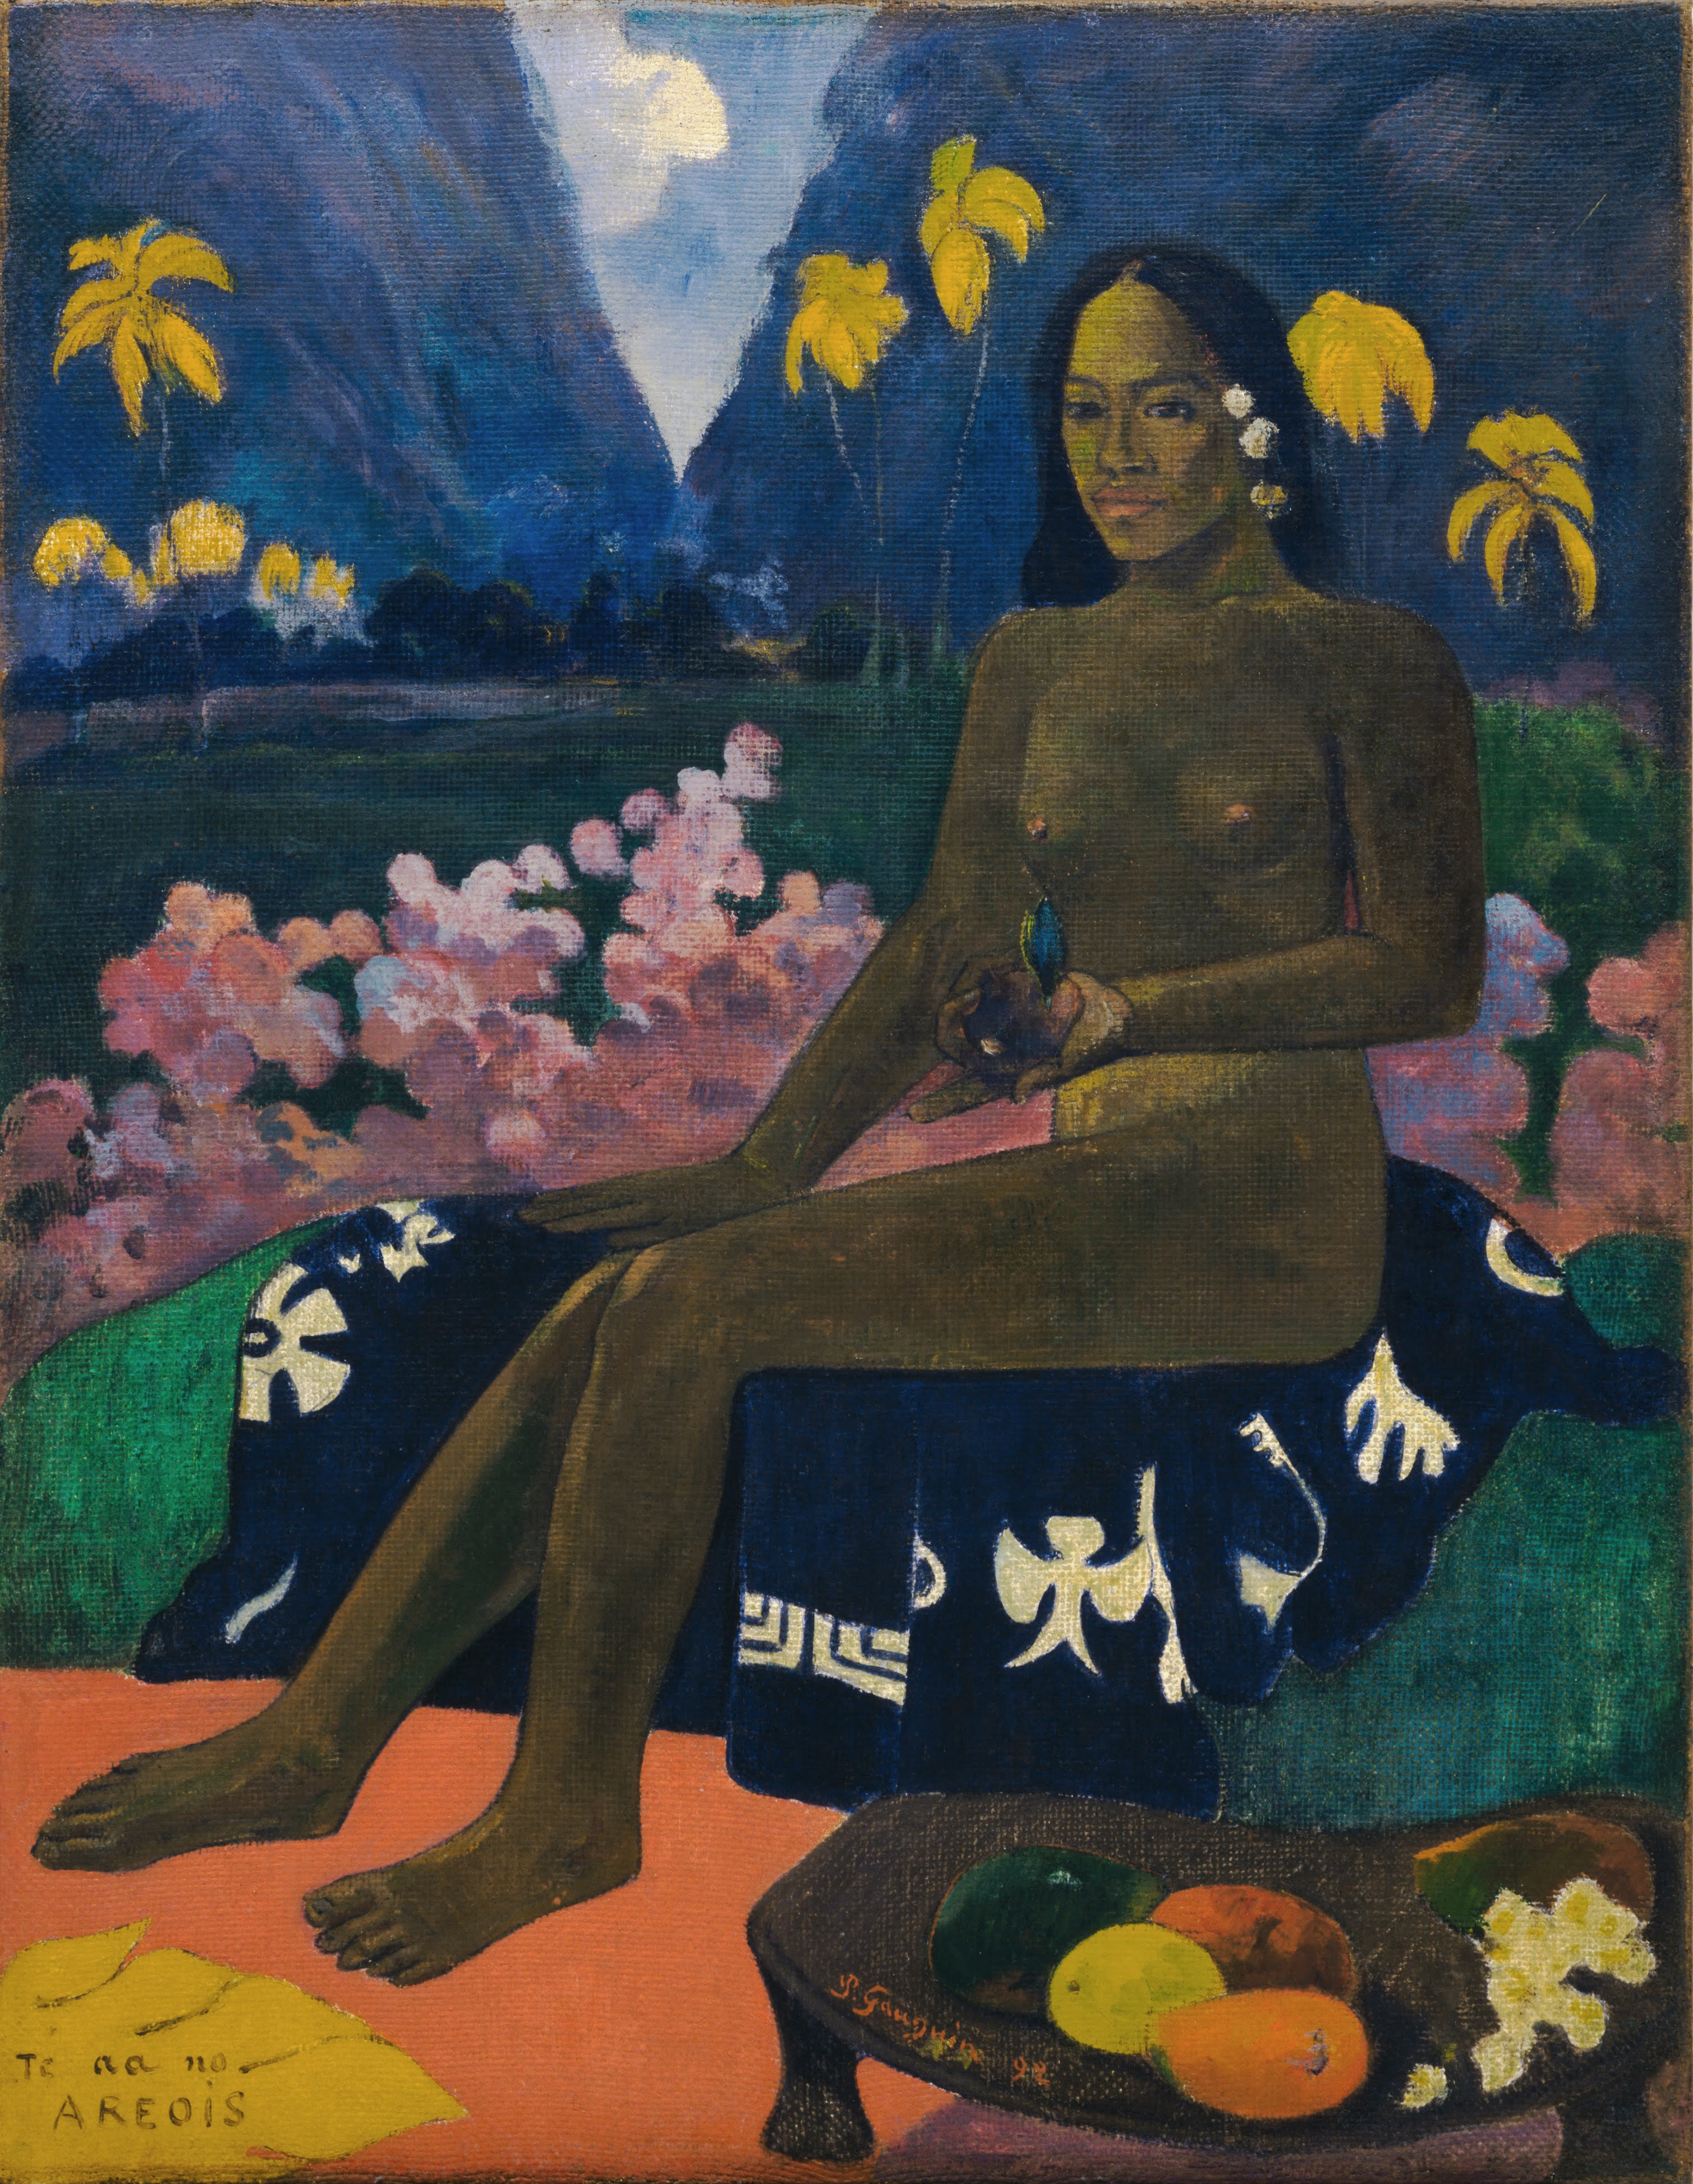 Paul_Gauguin_-_Te_aa_no_areois_-_Google_